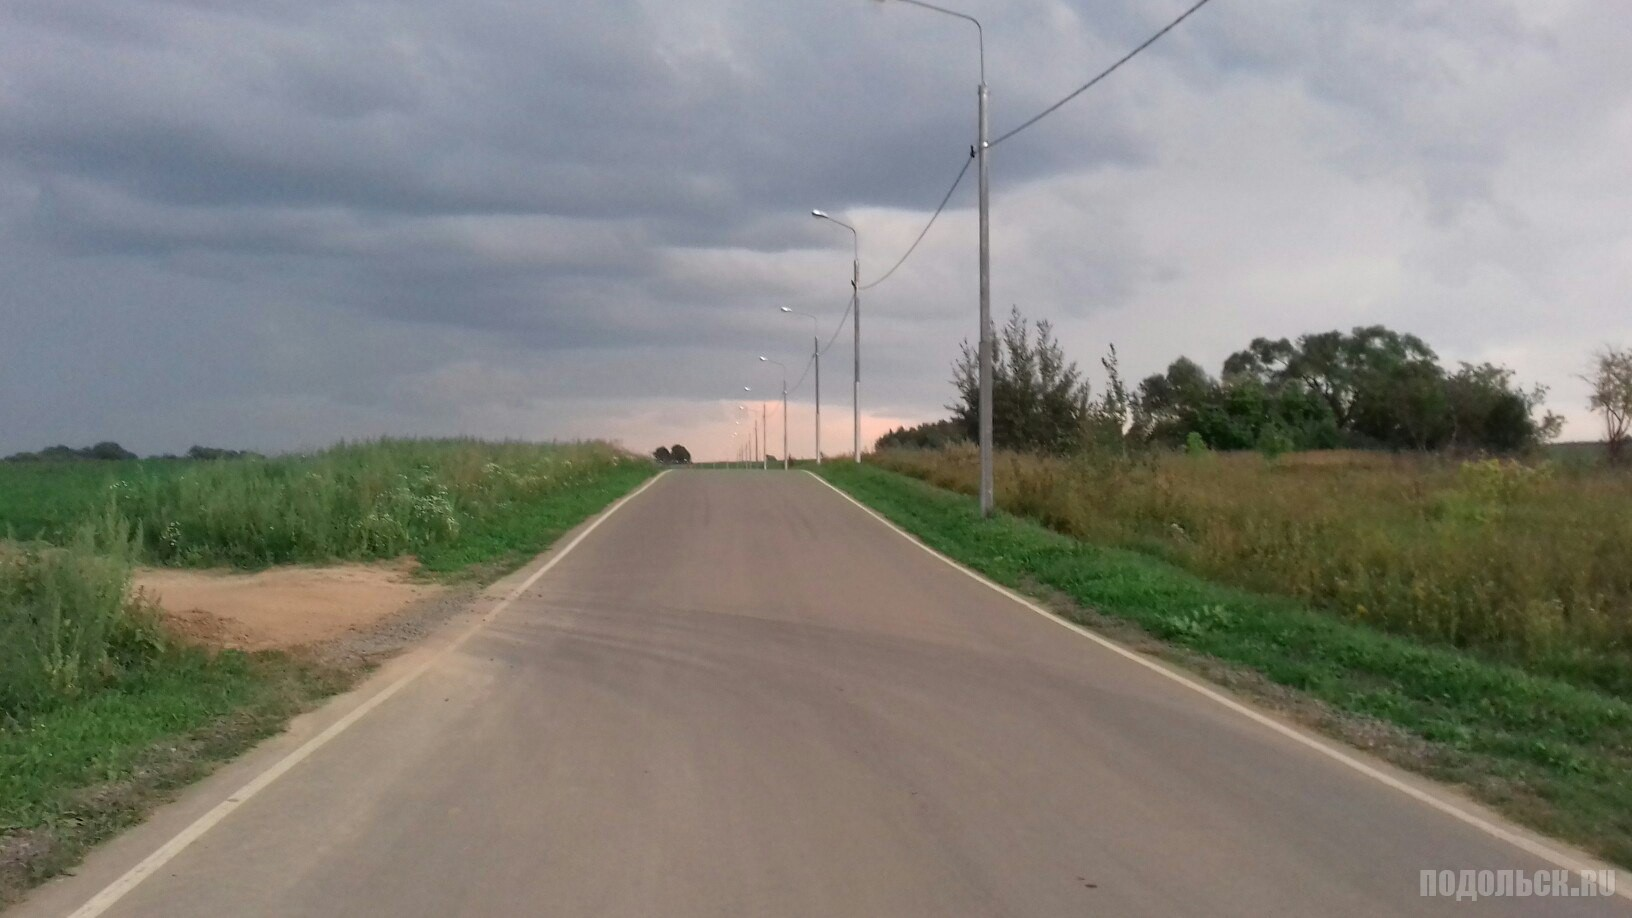 Дорога в районе Ознобишина. Август 2016.